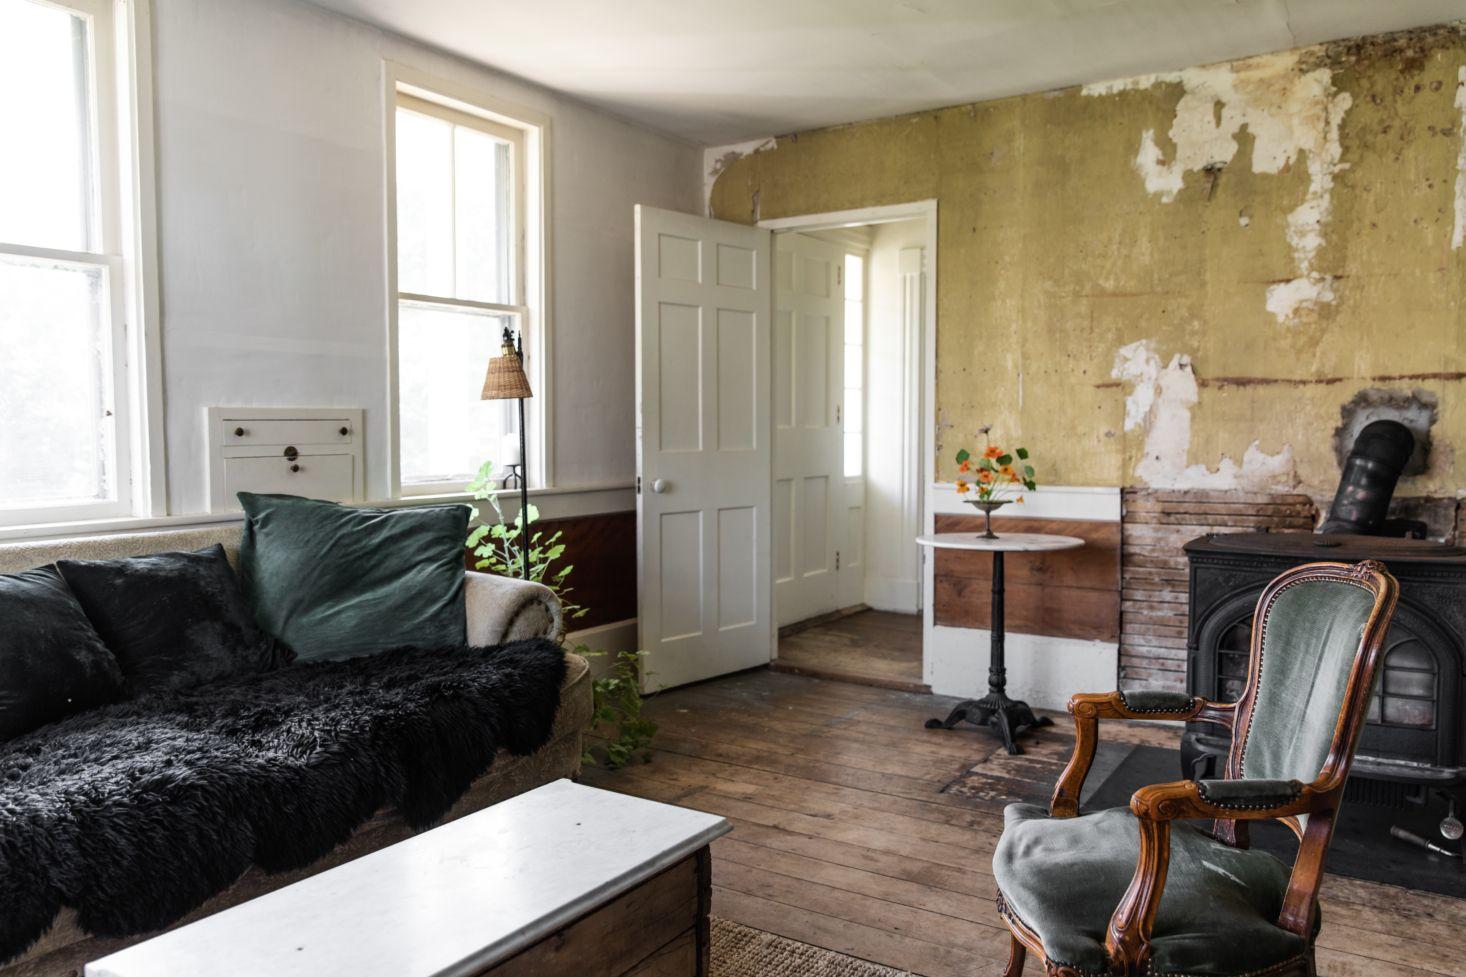 The House That Craigslist Built: A Bare